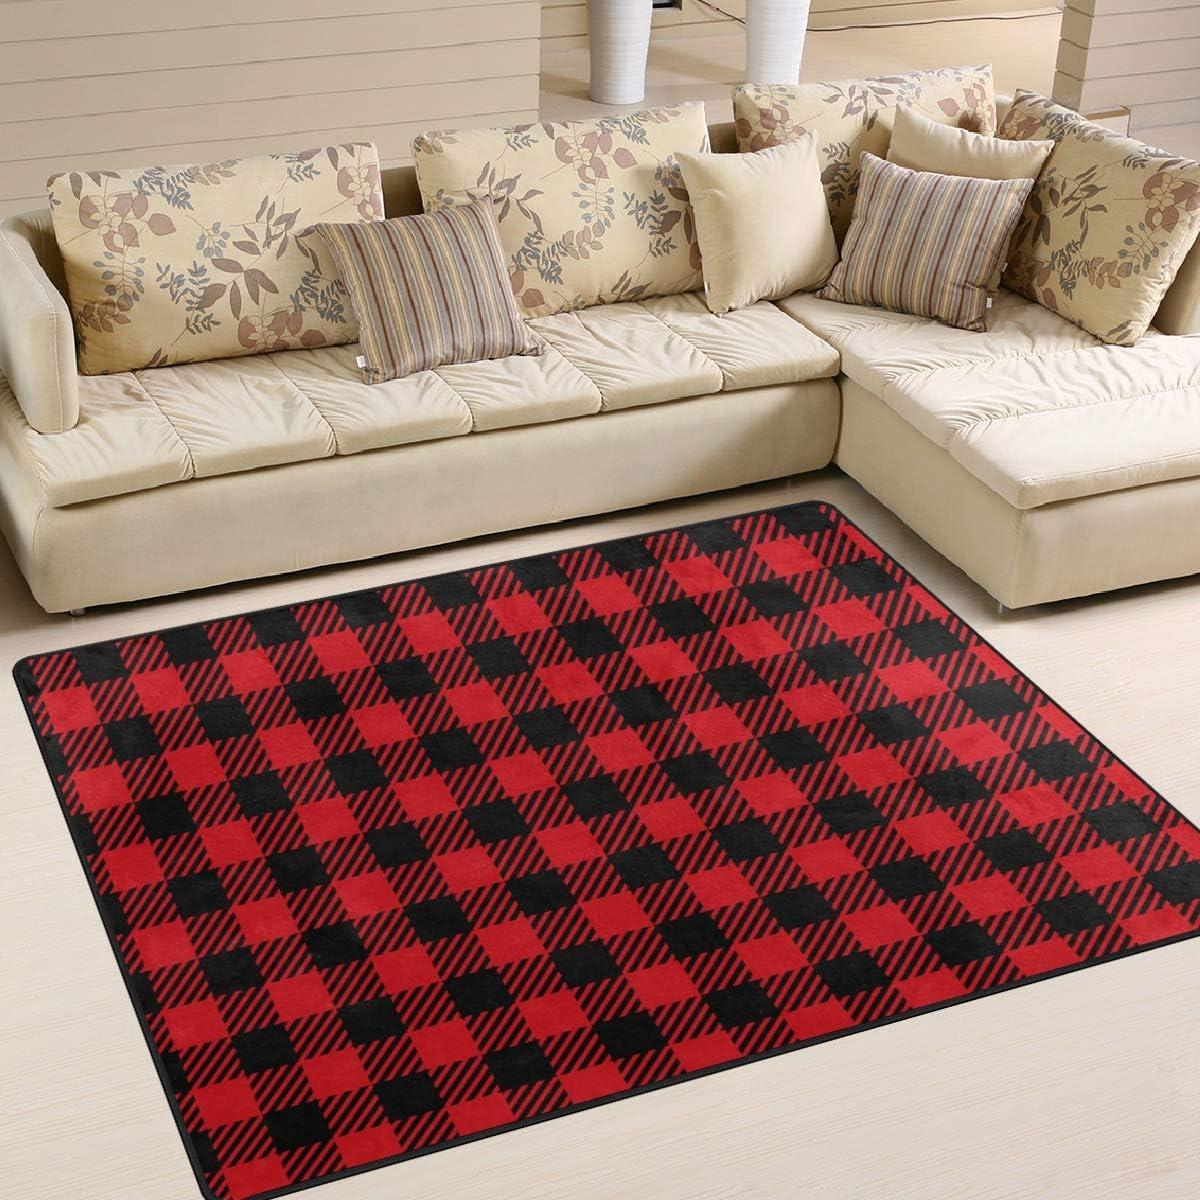 Amazon Com Area Rugs Red Black Buffalo Plaid Seamless Indoor Outdoor Floor Mat Livingroom Bedroom Sofa Carpet Non Slip Home Hotel Large Custom Area Rug Mat 6 67 X4 83 Kitchen Dining